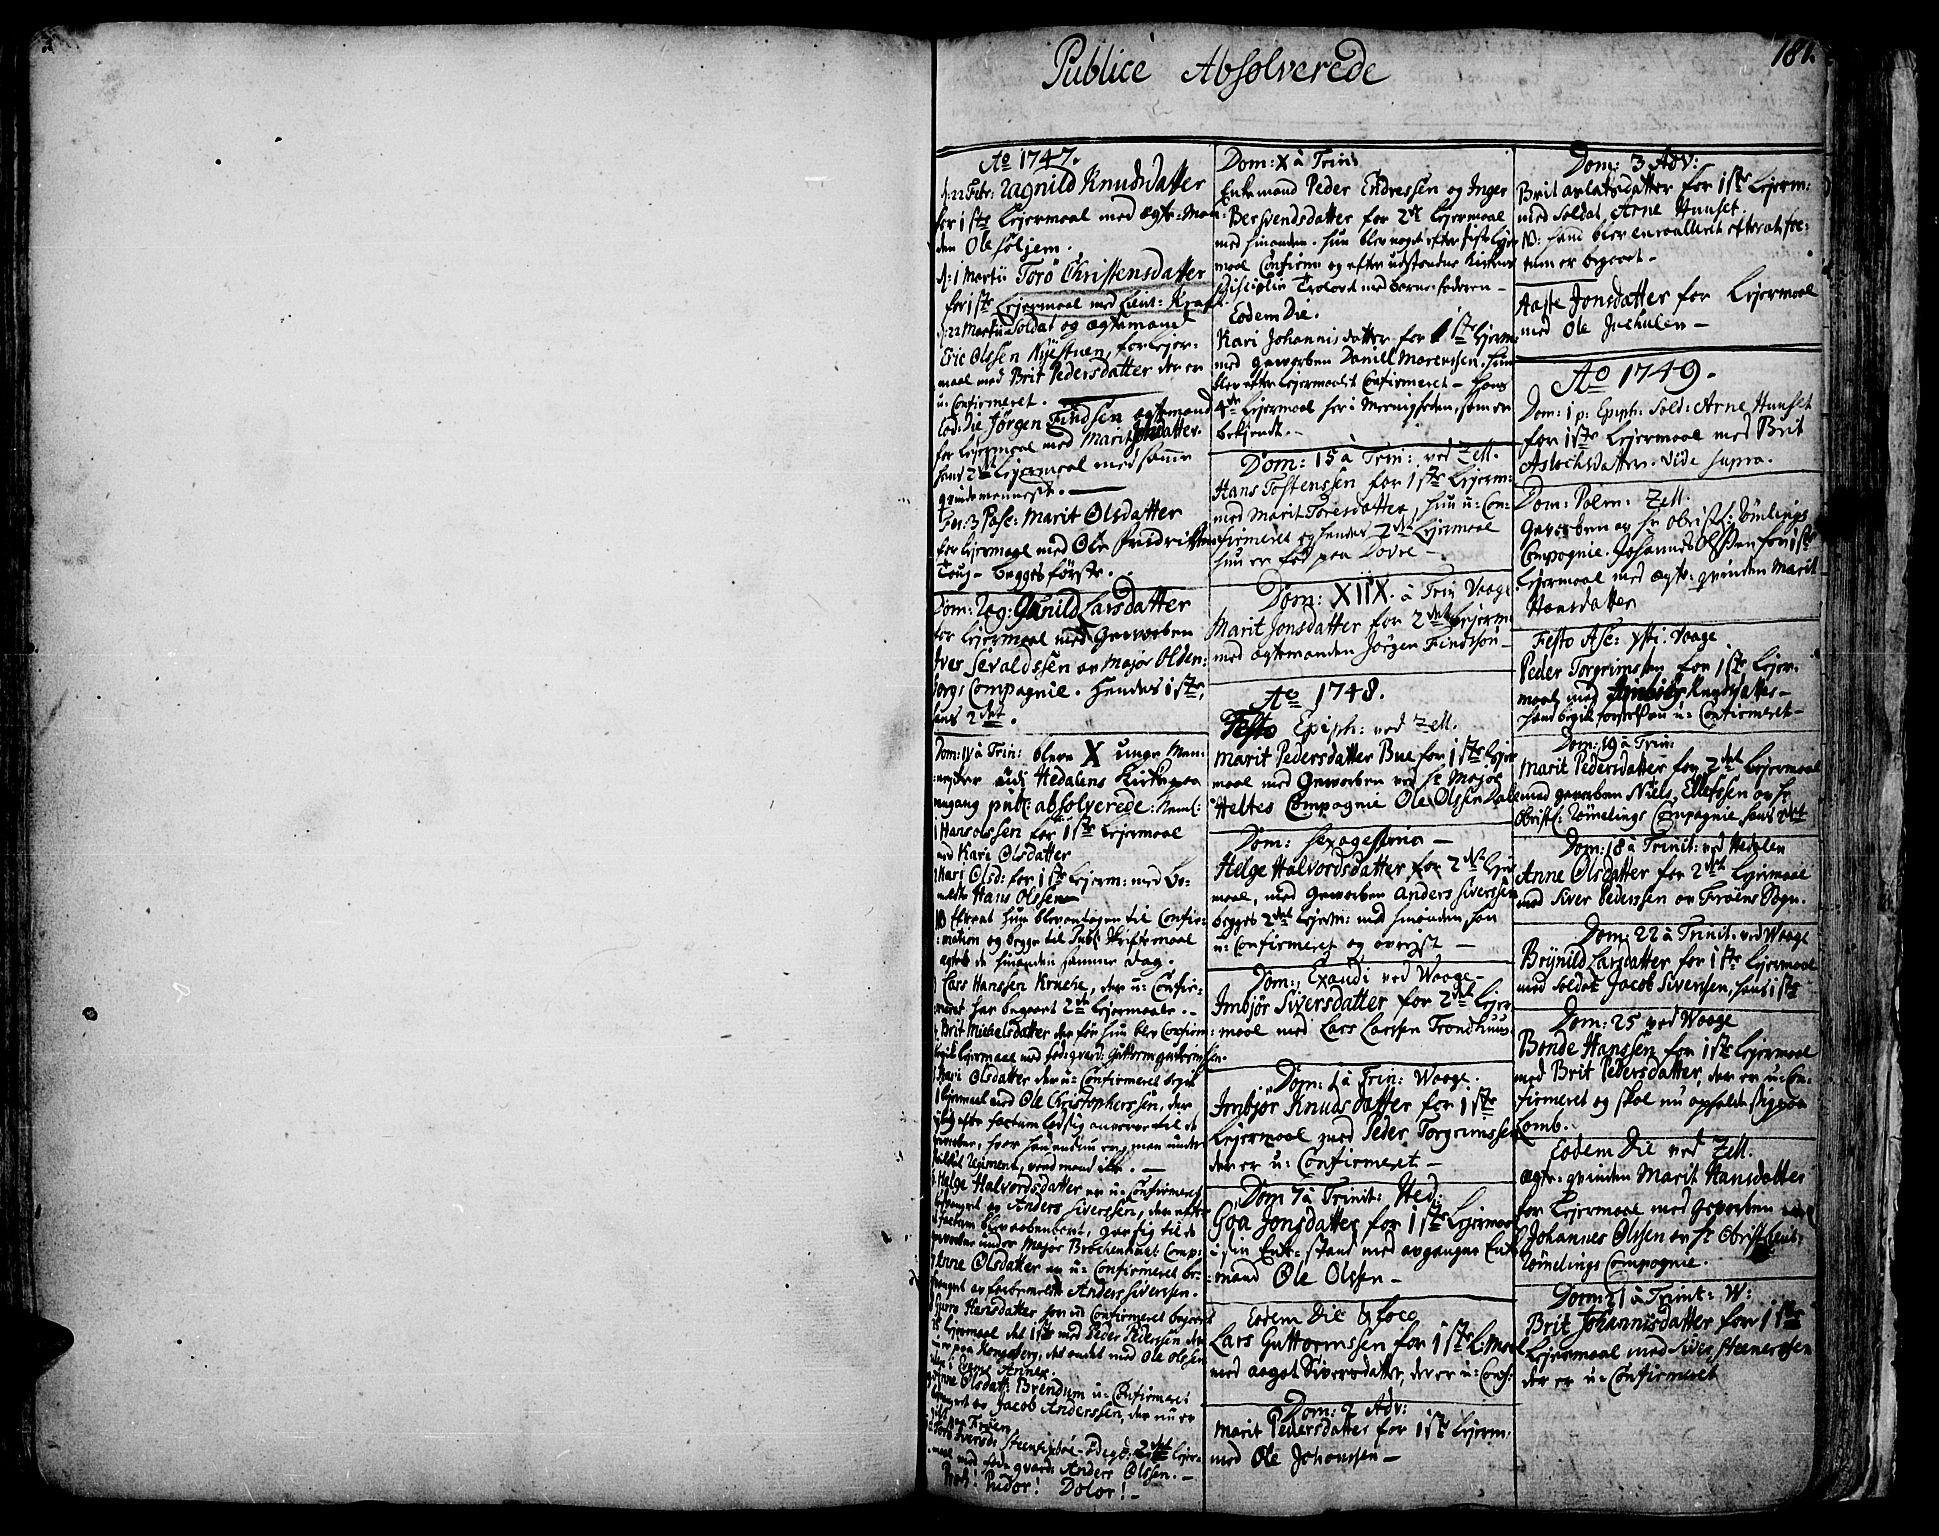 SAH, Vågå prestekontor, Ministerialbok nr. 1, 1739-1810, s. 181